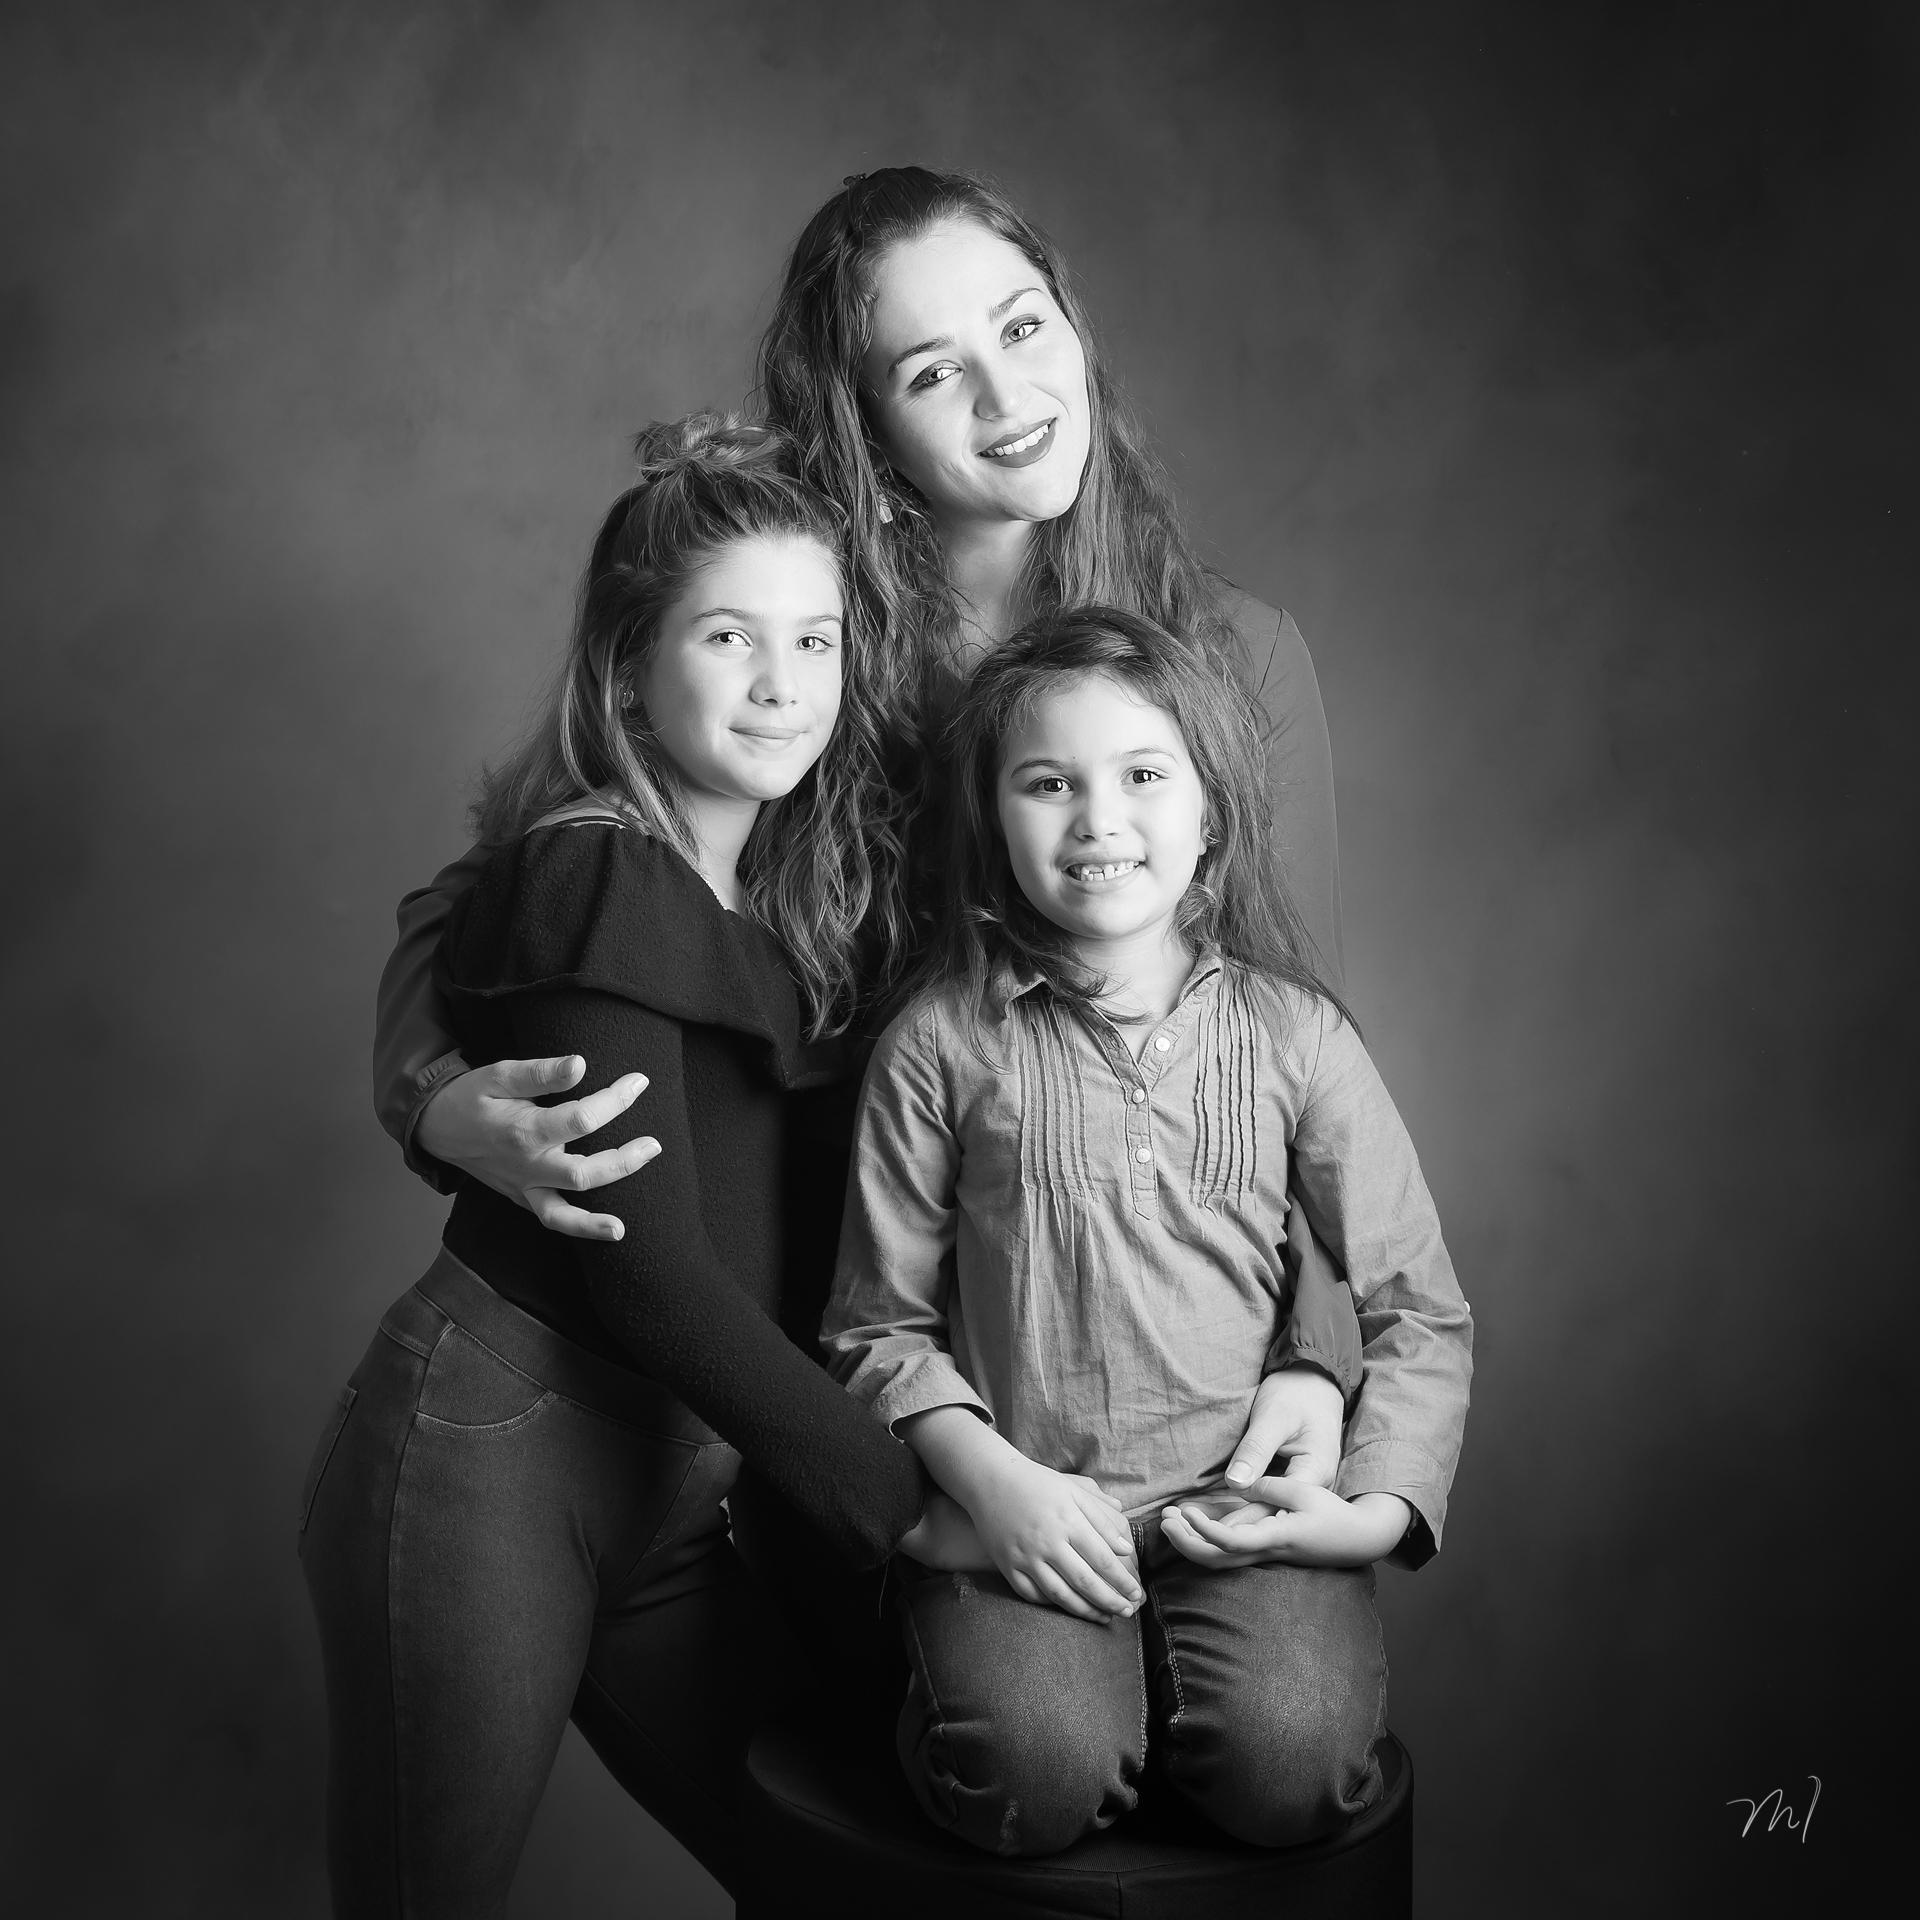 Familles & enfants - Marie Ismalun photographe-6